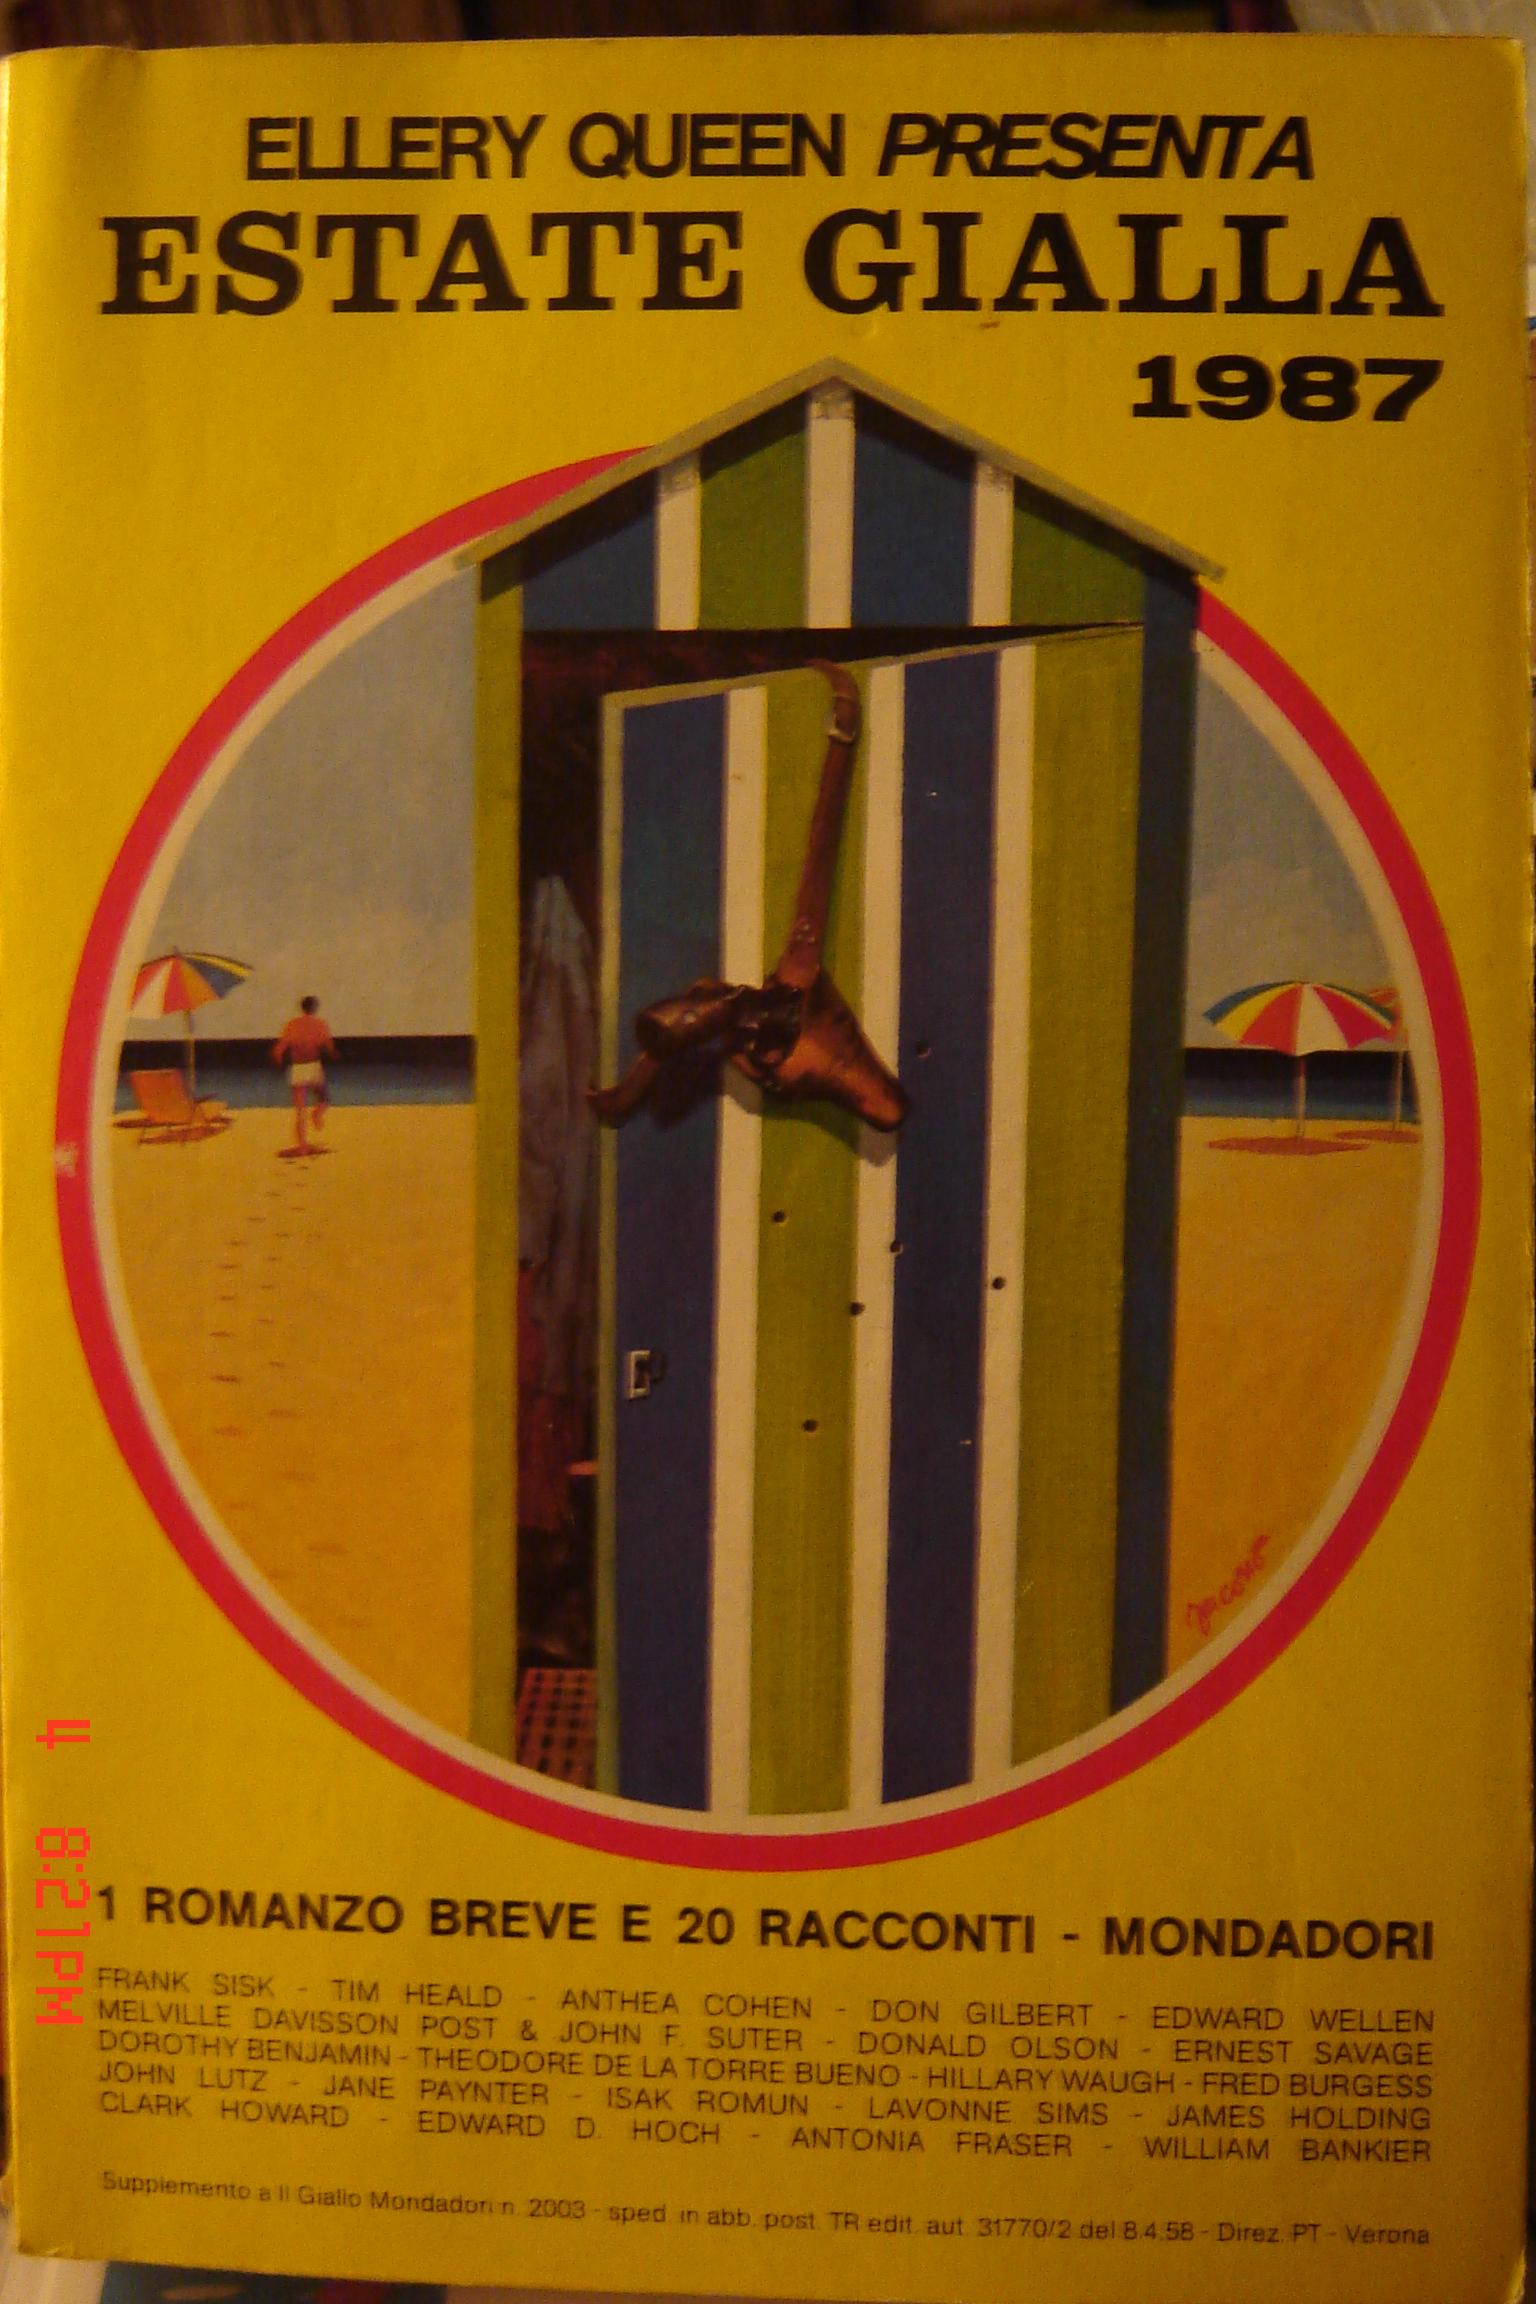 Ellery Queen presenta Estate gialla 1987